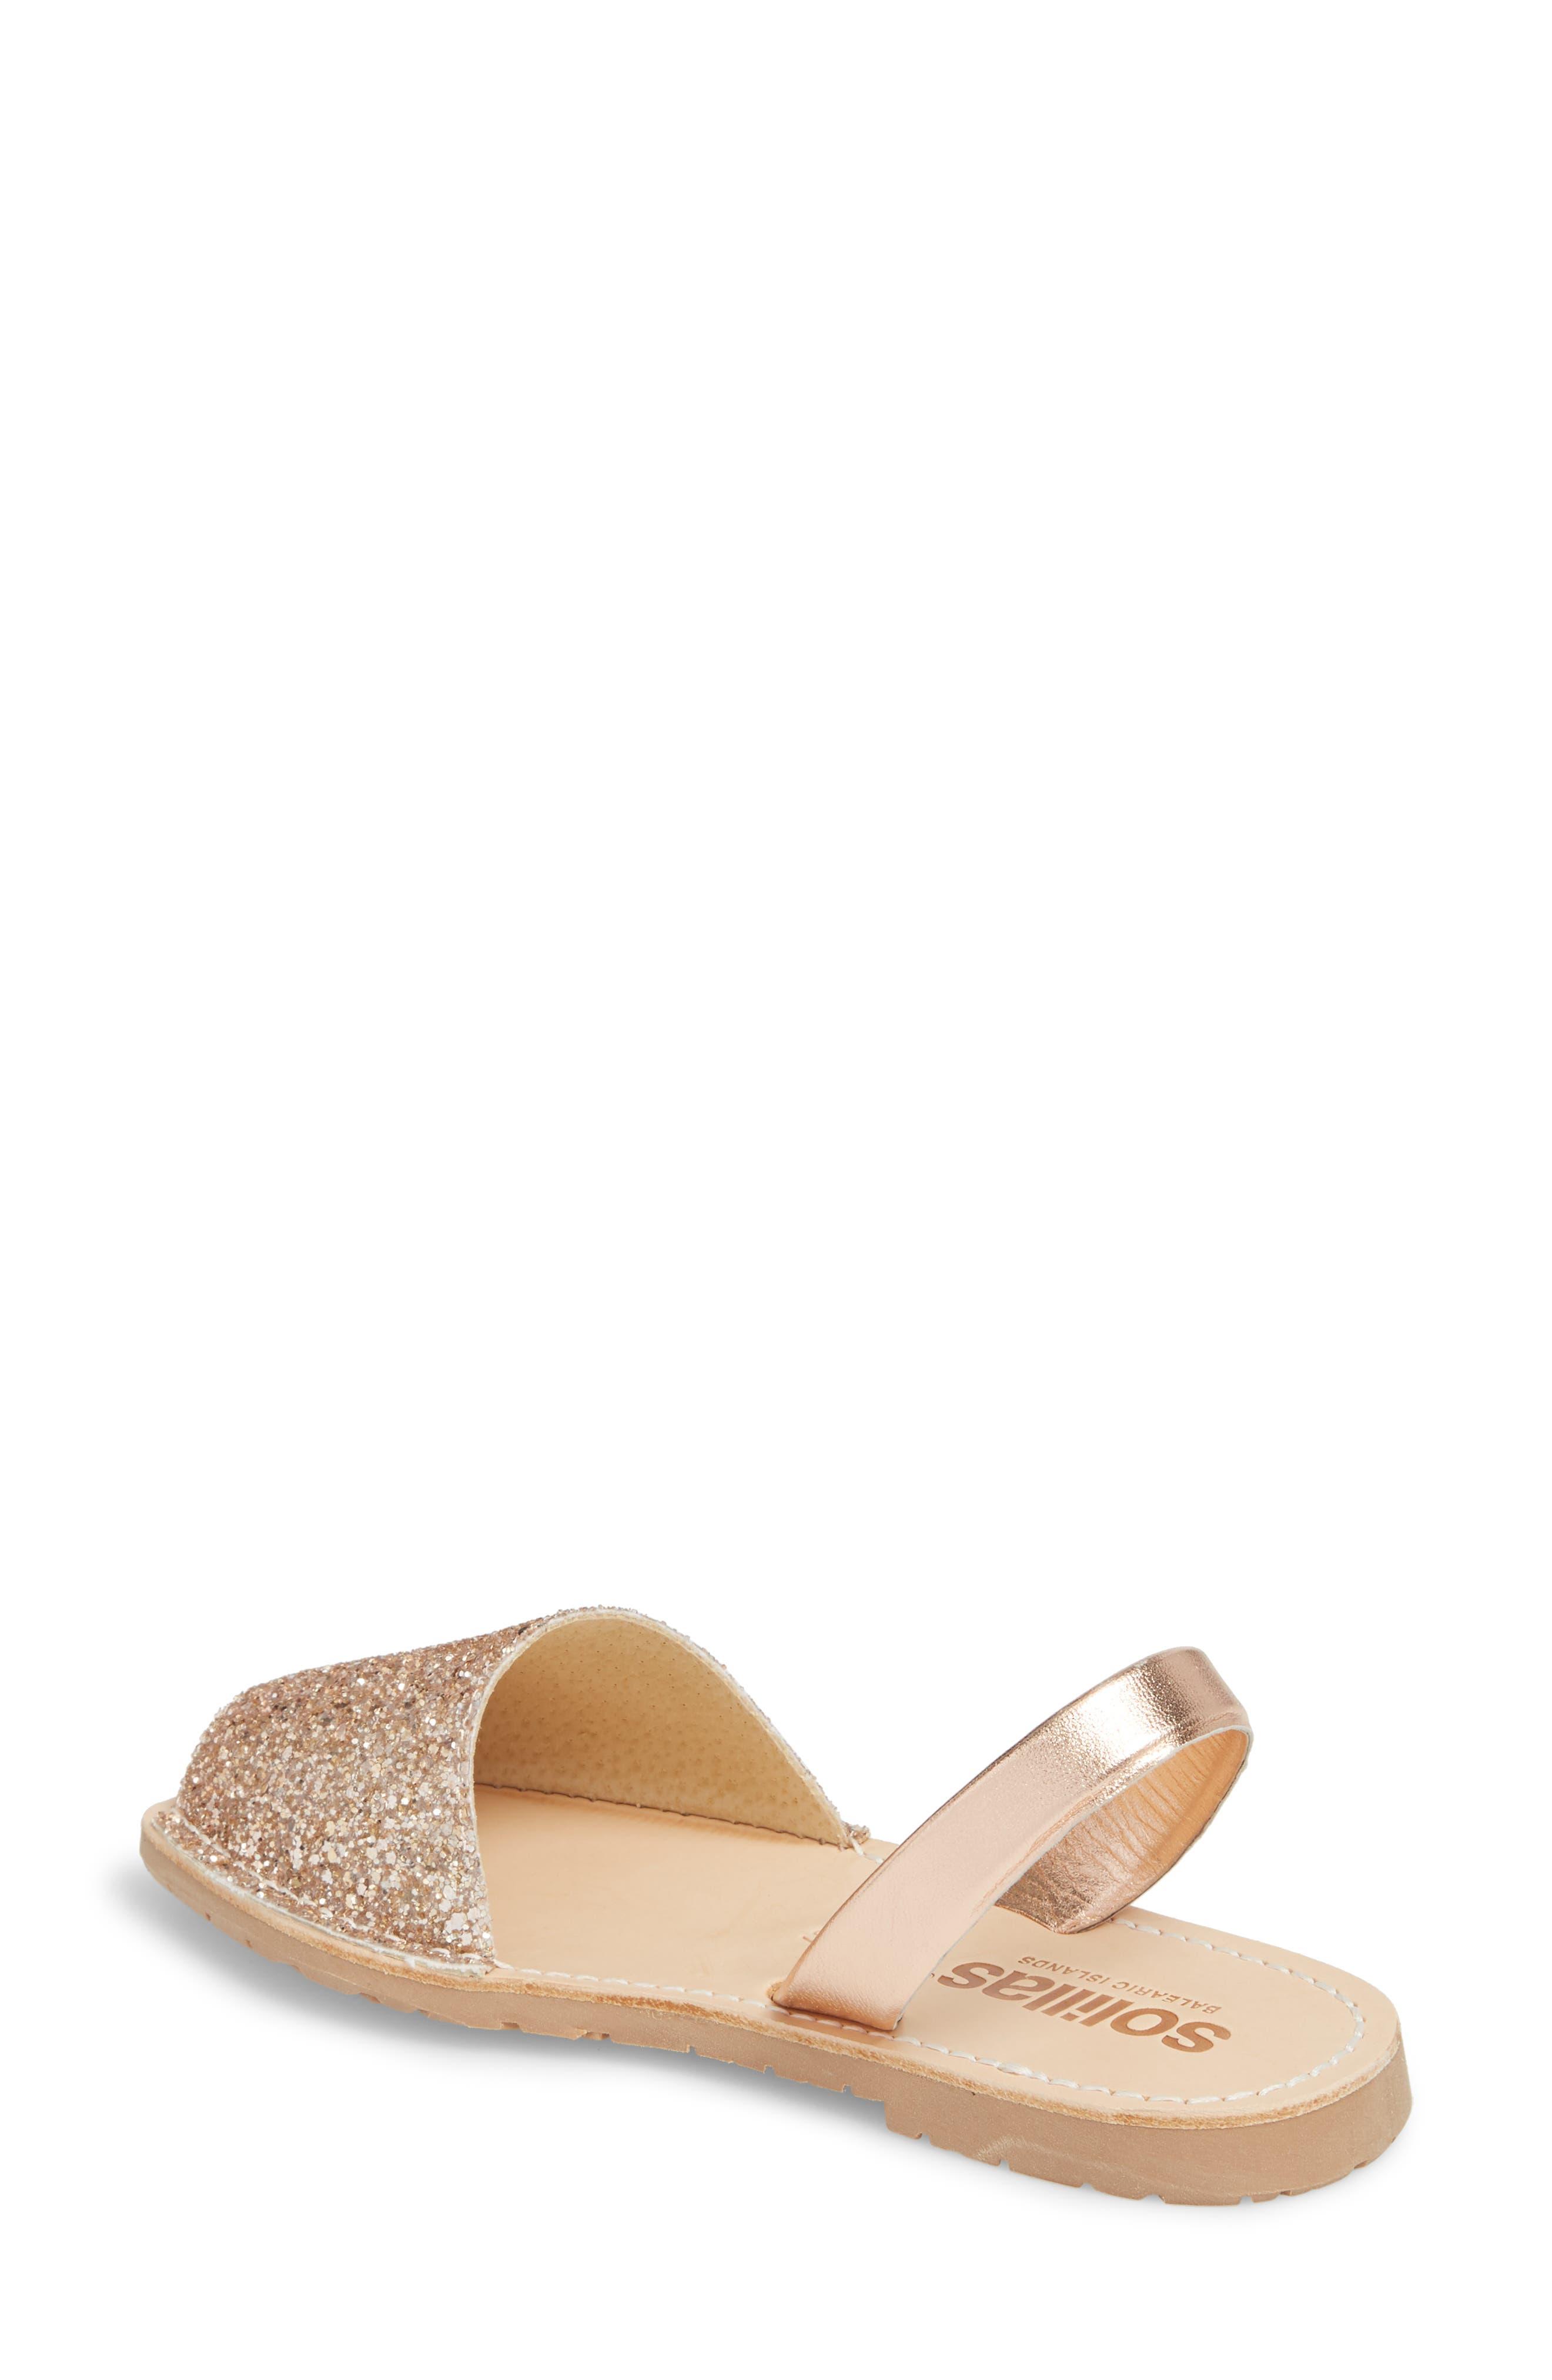 Flat Sandal,                             Alternate thumbnail 2, color,                             Rose Gold Leather